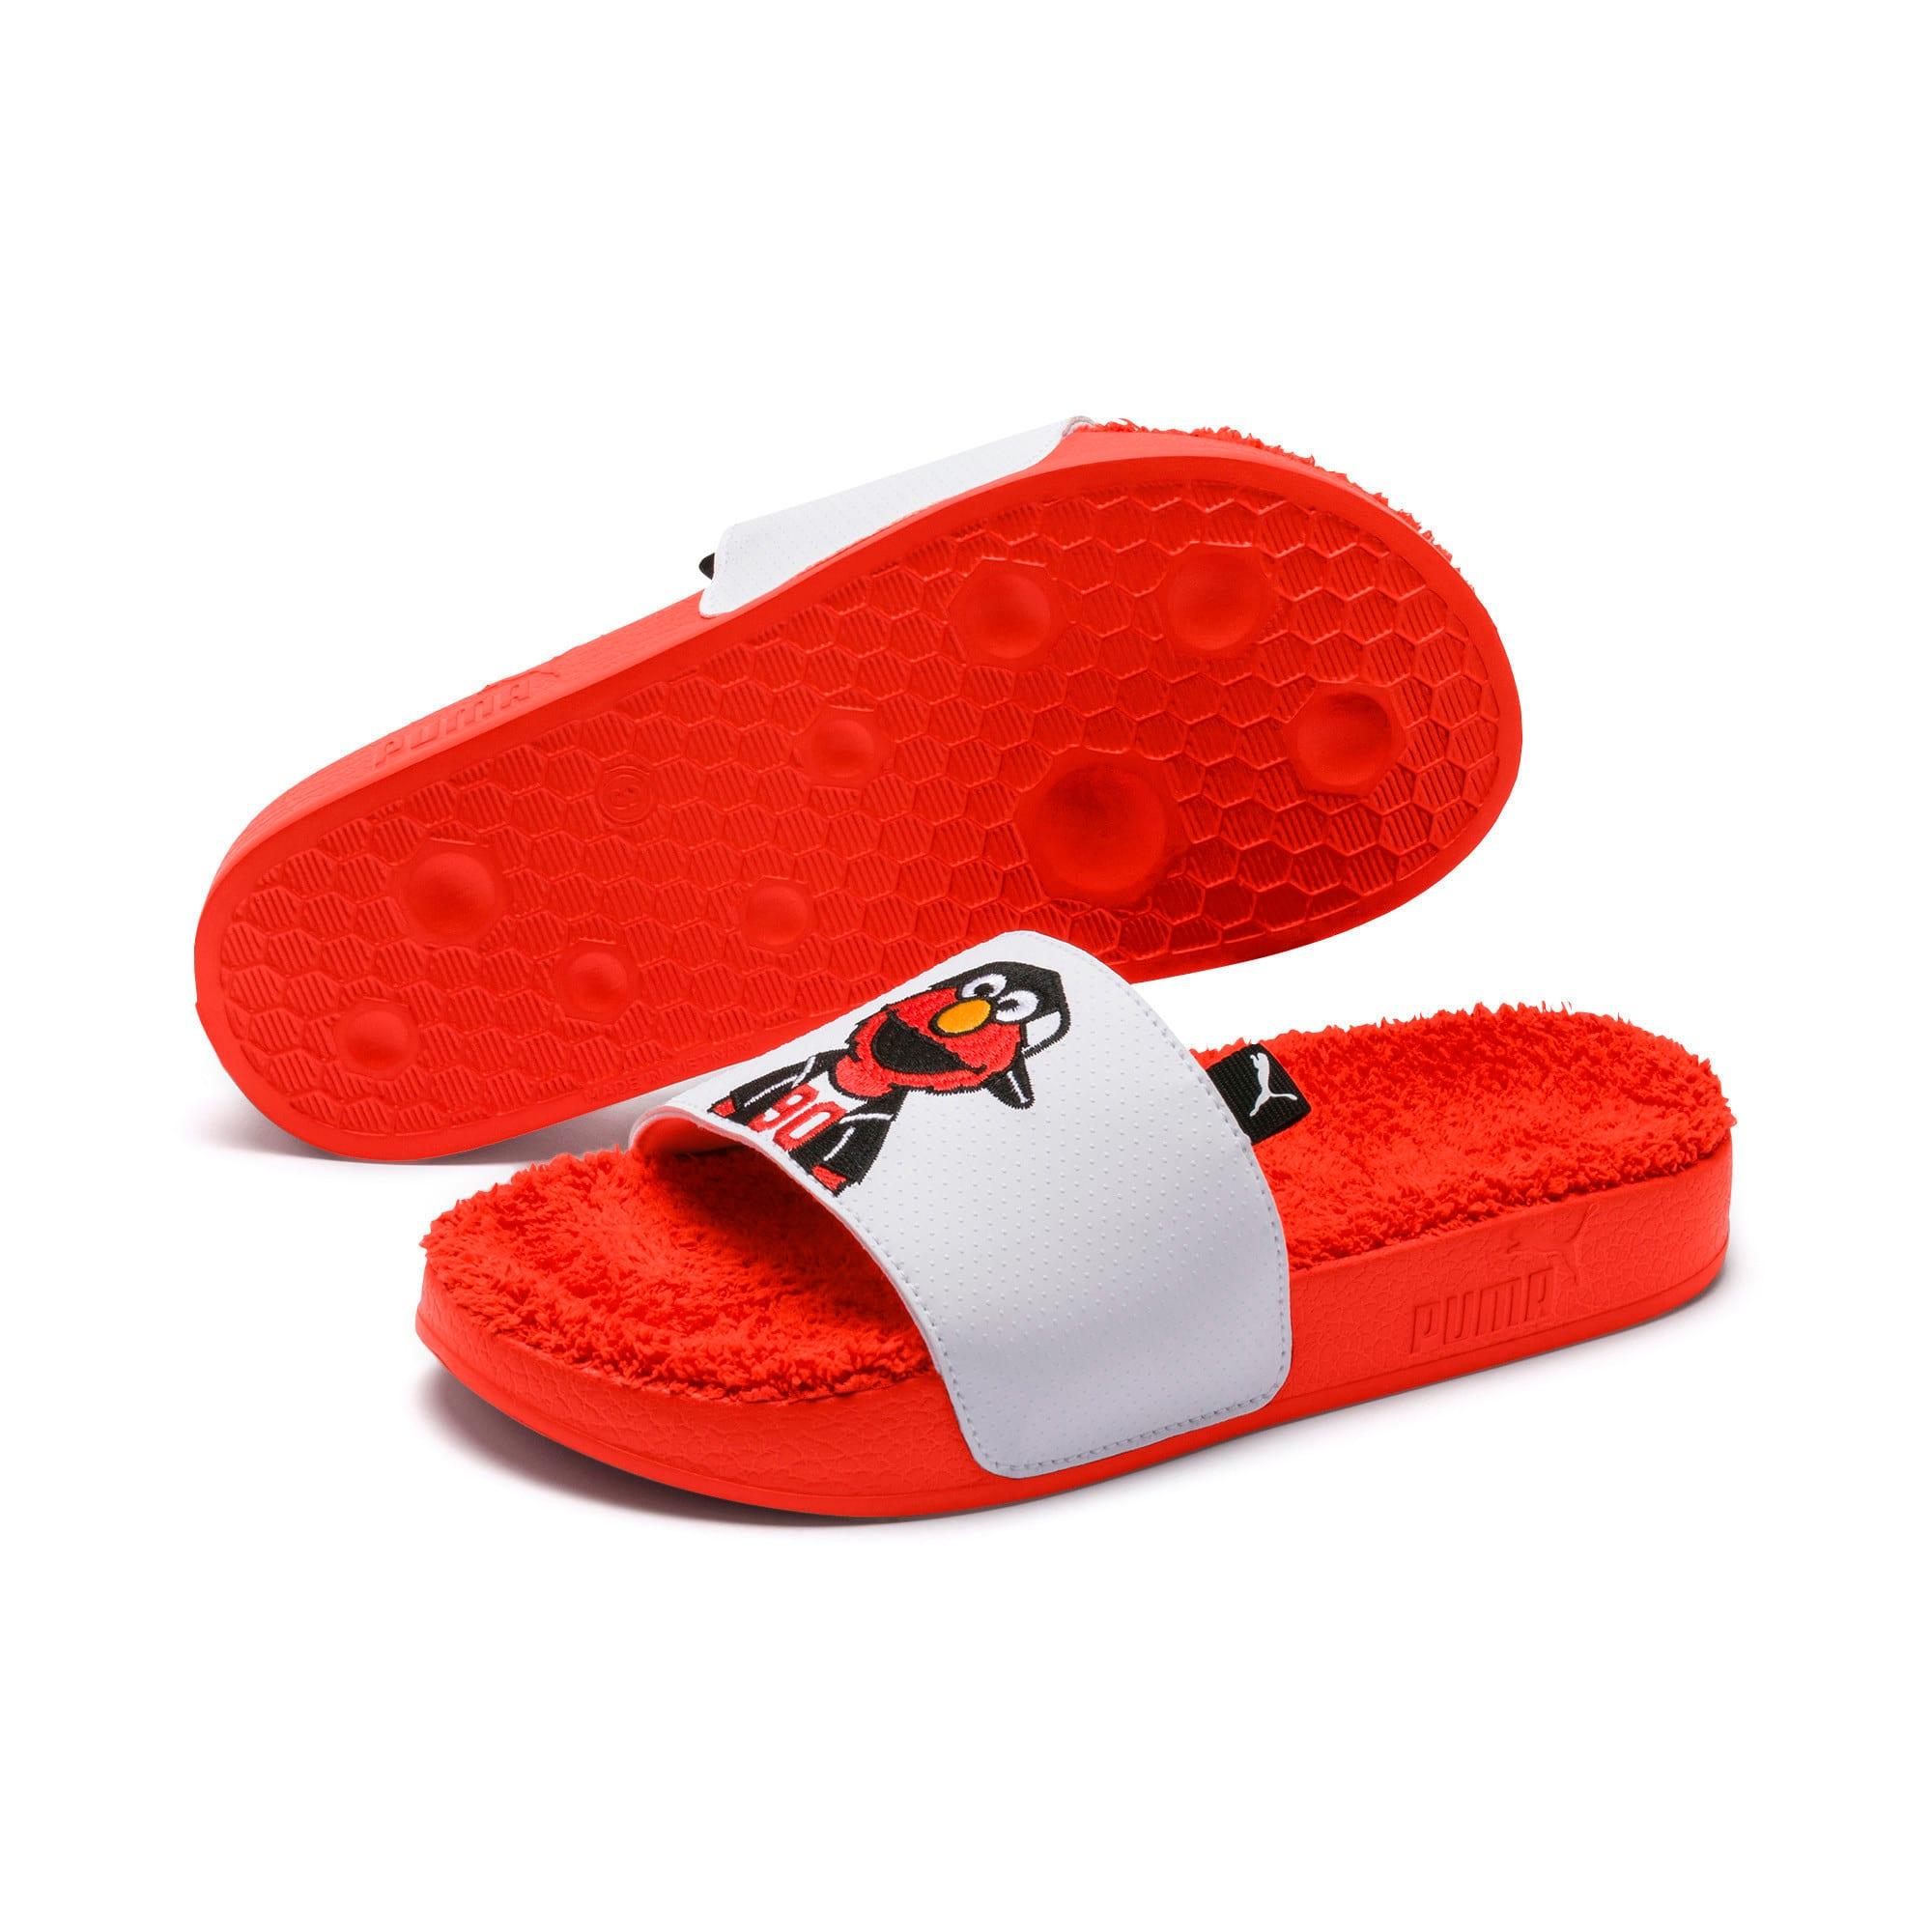 Thumbnail 2 of Sesame Street Kids' Leadcat Sandals, Cherry Tomato-Puma White, medium-IND